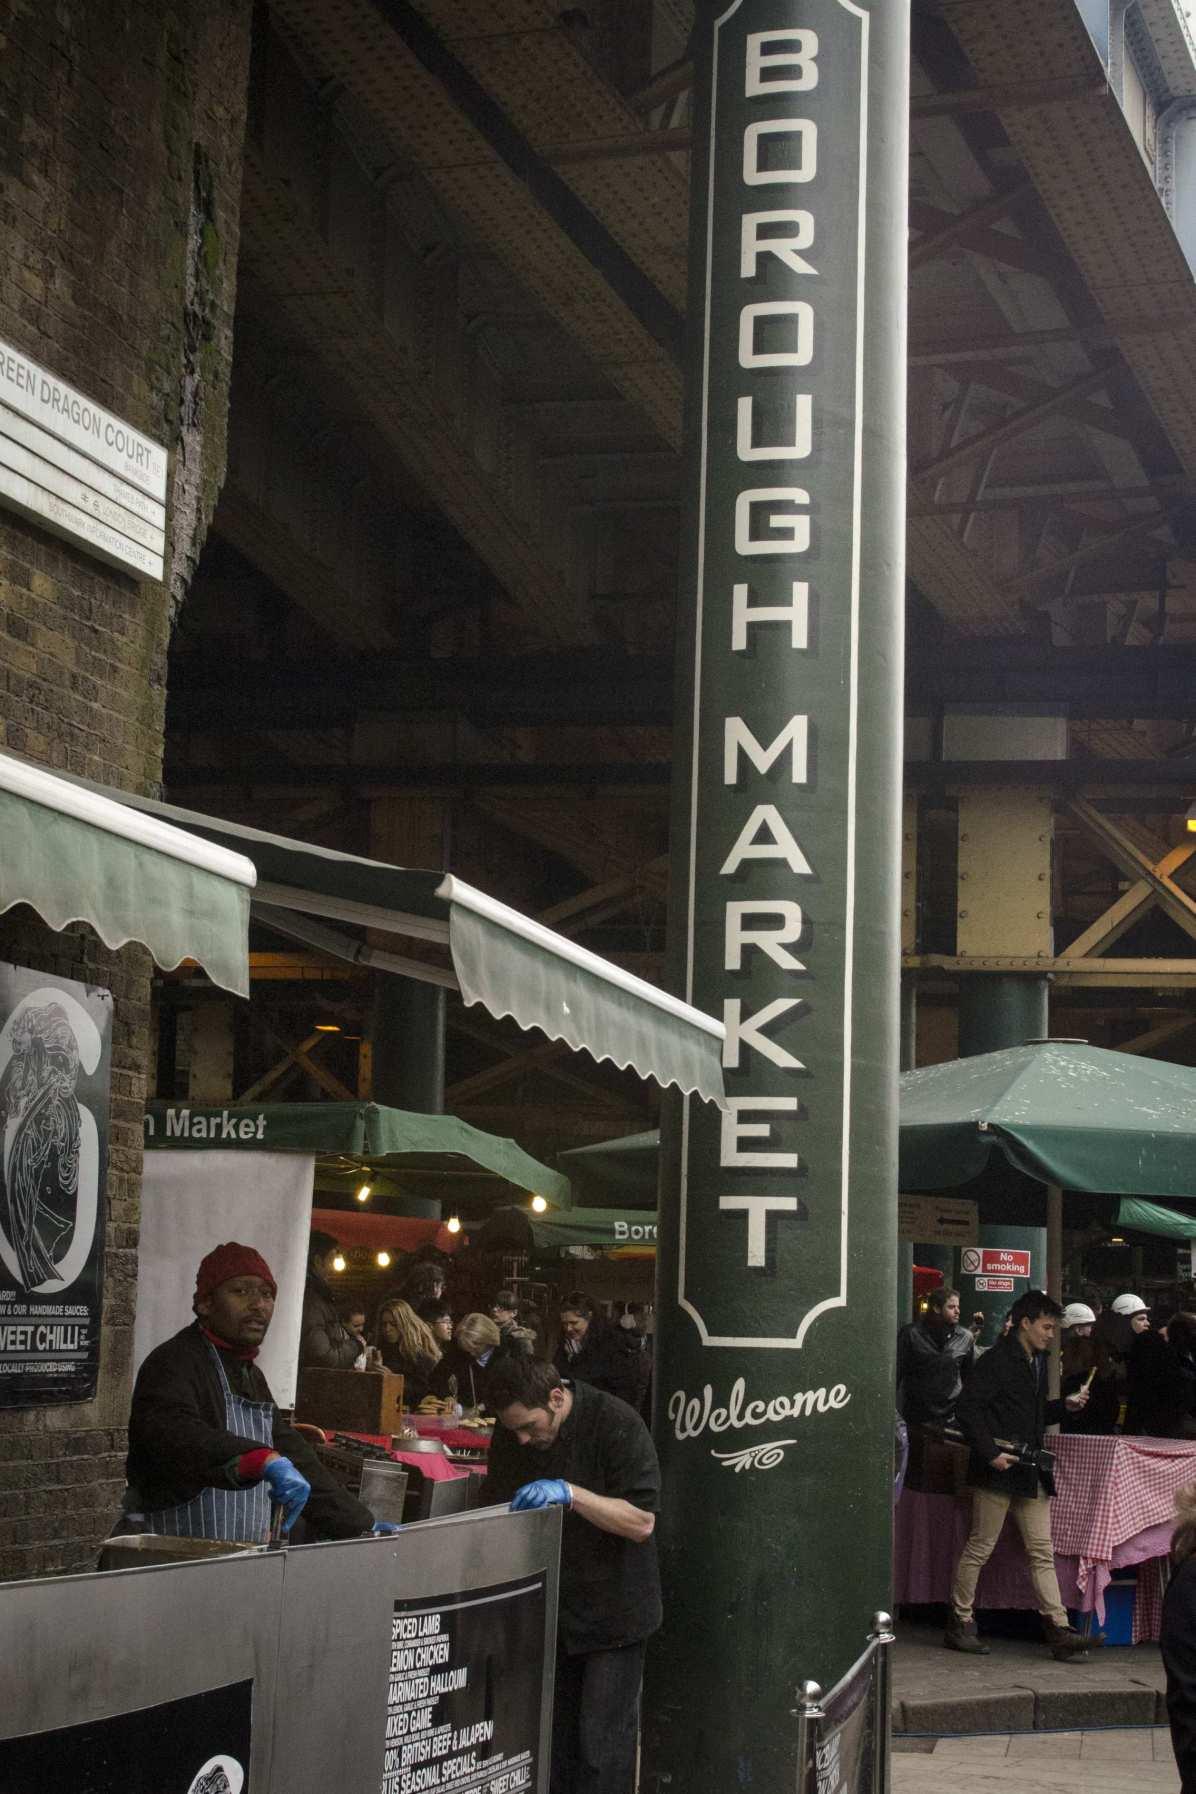 London neighborhoods - The Borough Market - Eat well in London